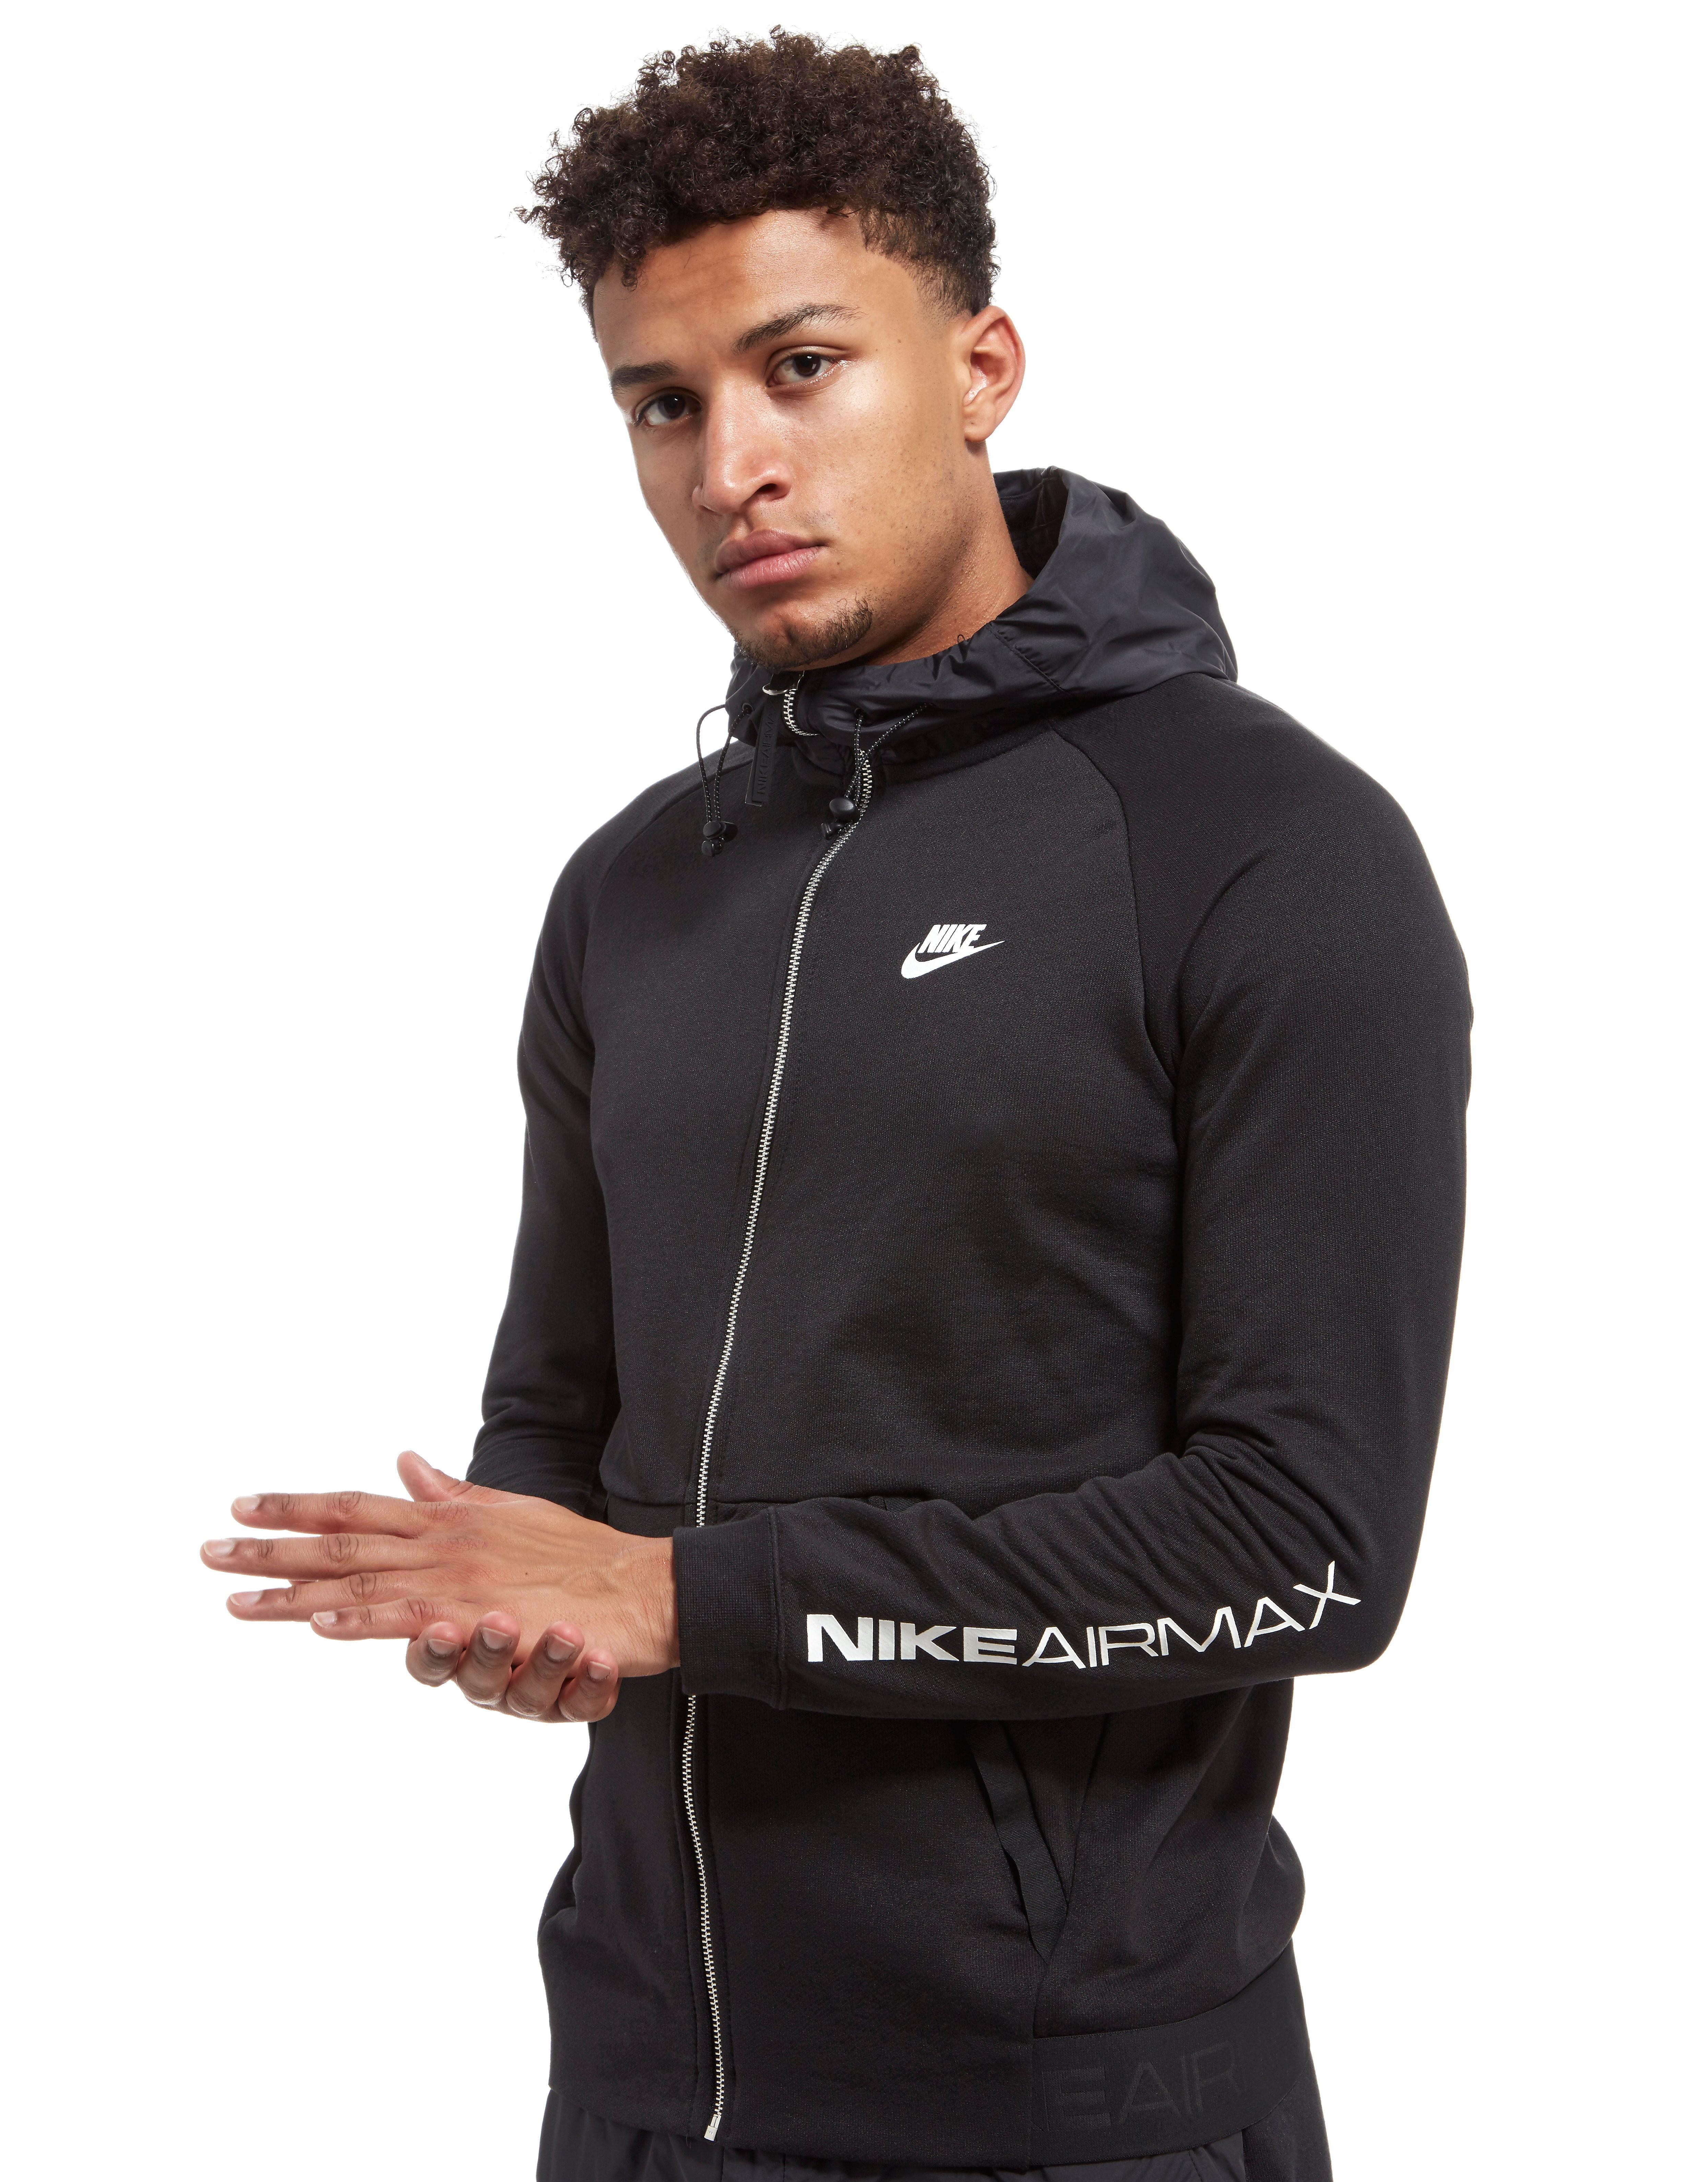 Nike Air Max FT Durchgehender RV Hoodie